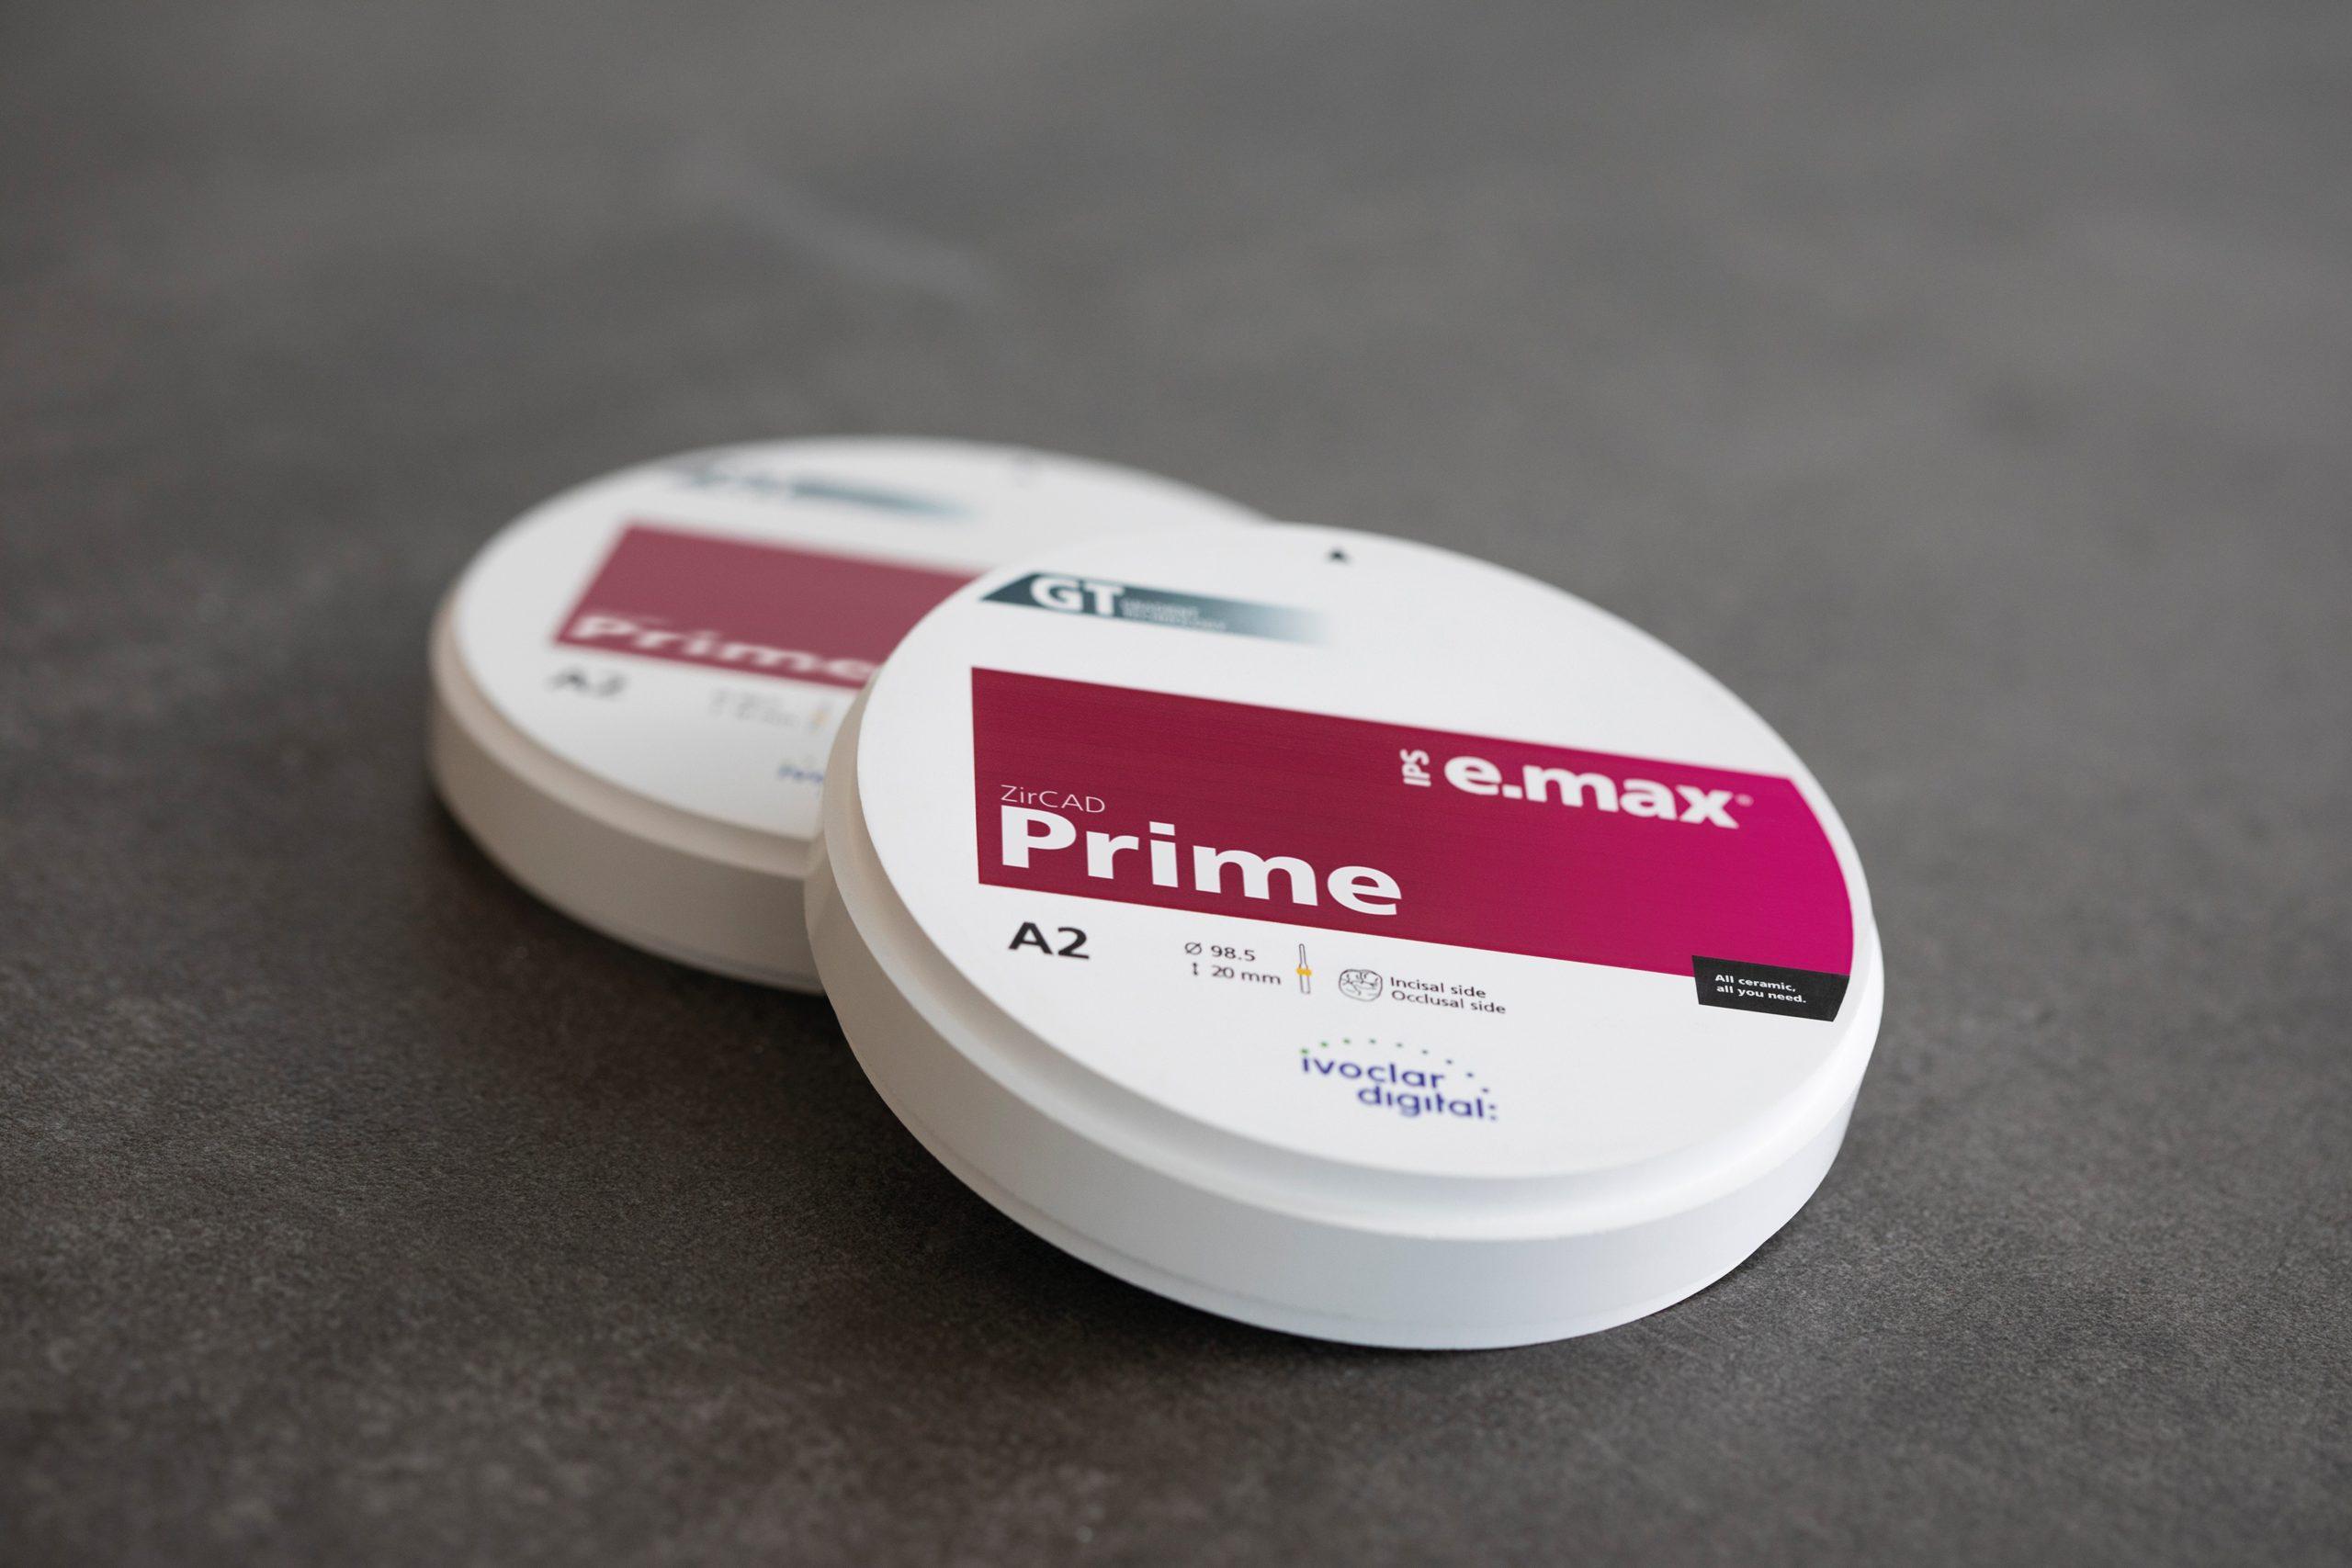 IPS e.max ジルキャド プライムの写真